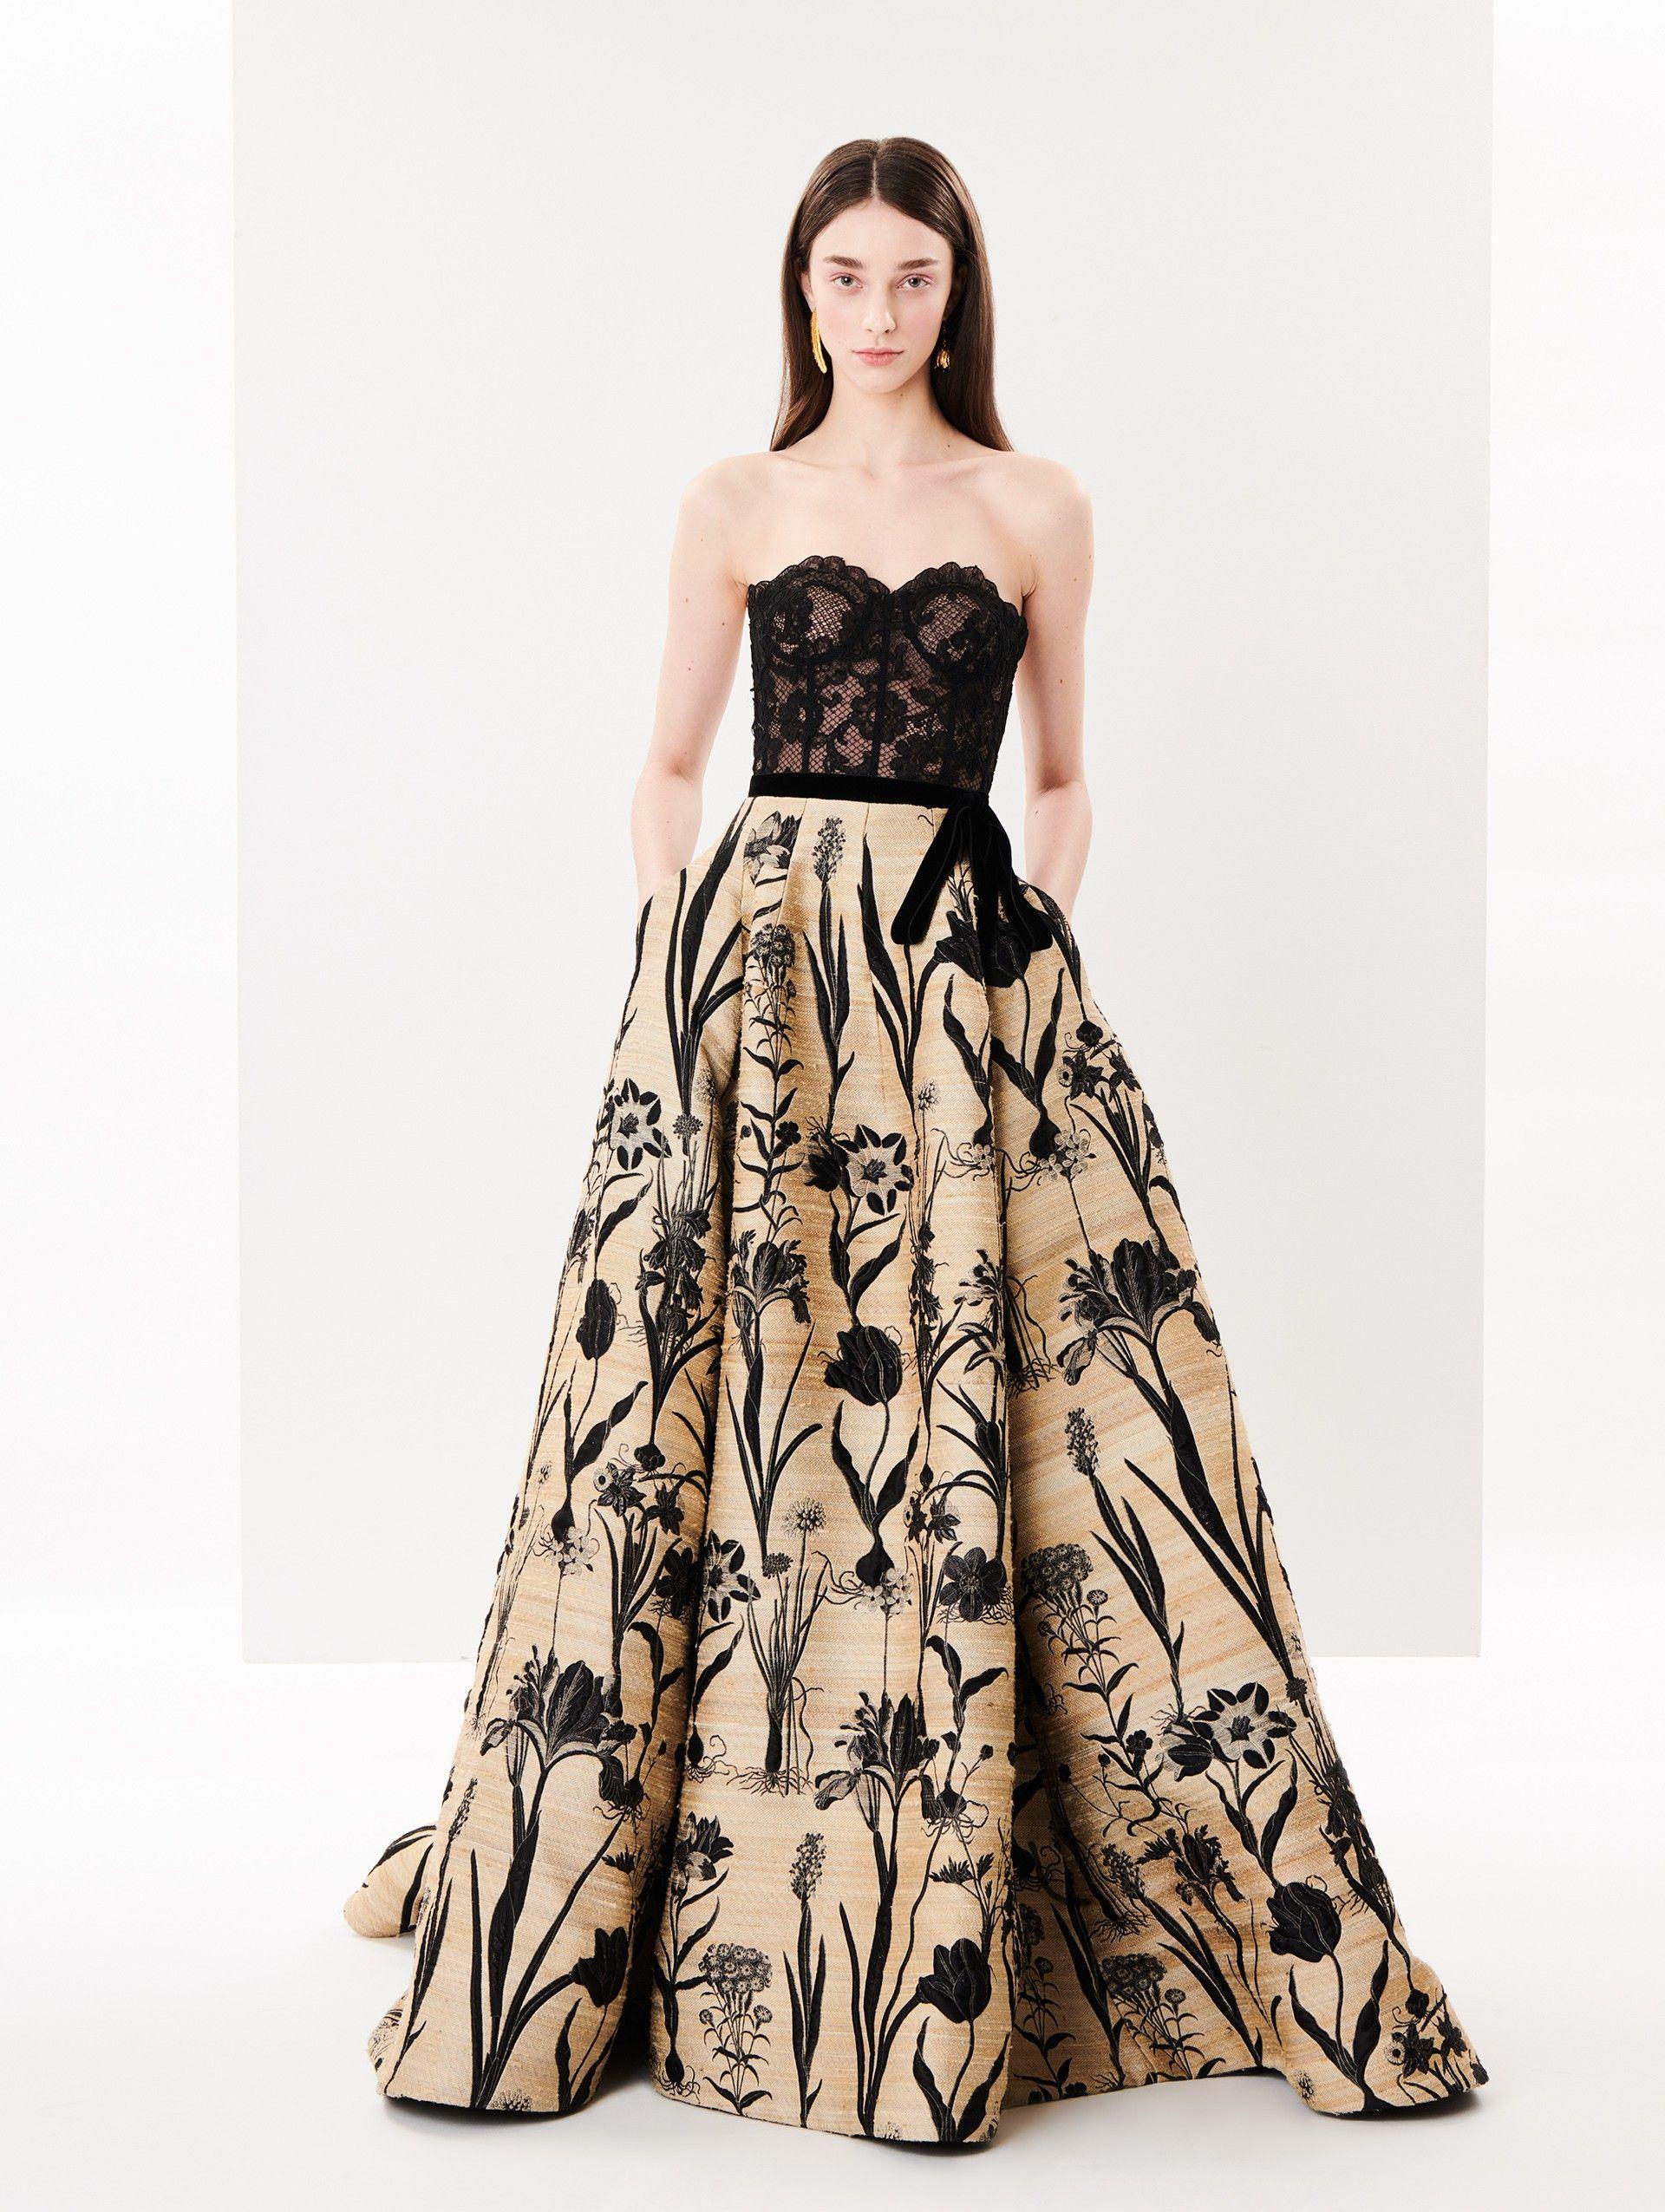 Rustic Evening Dress